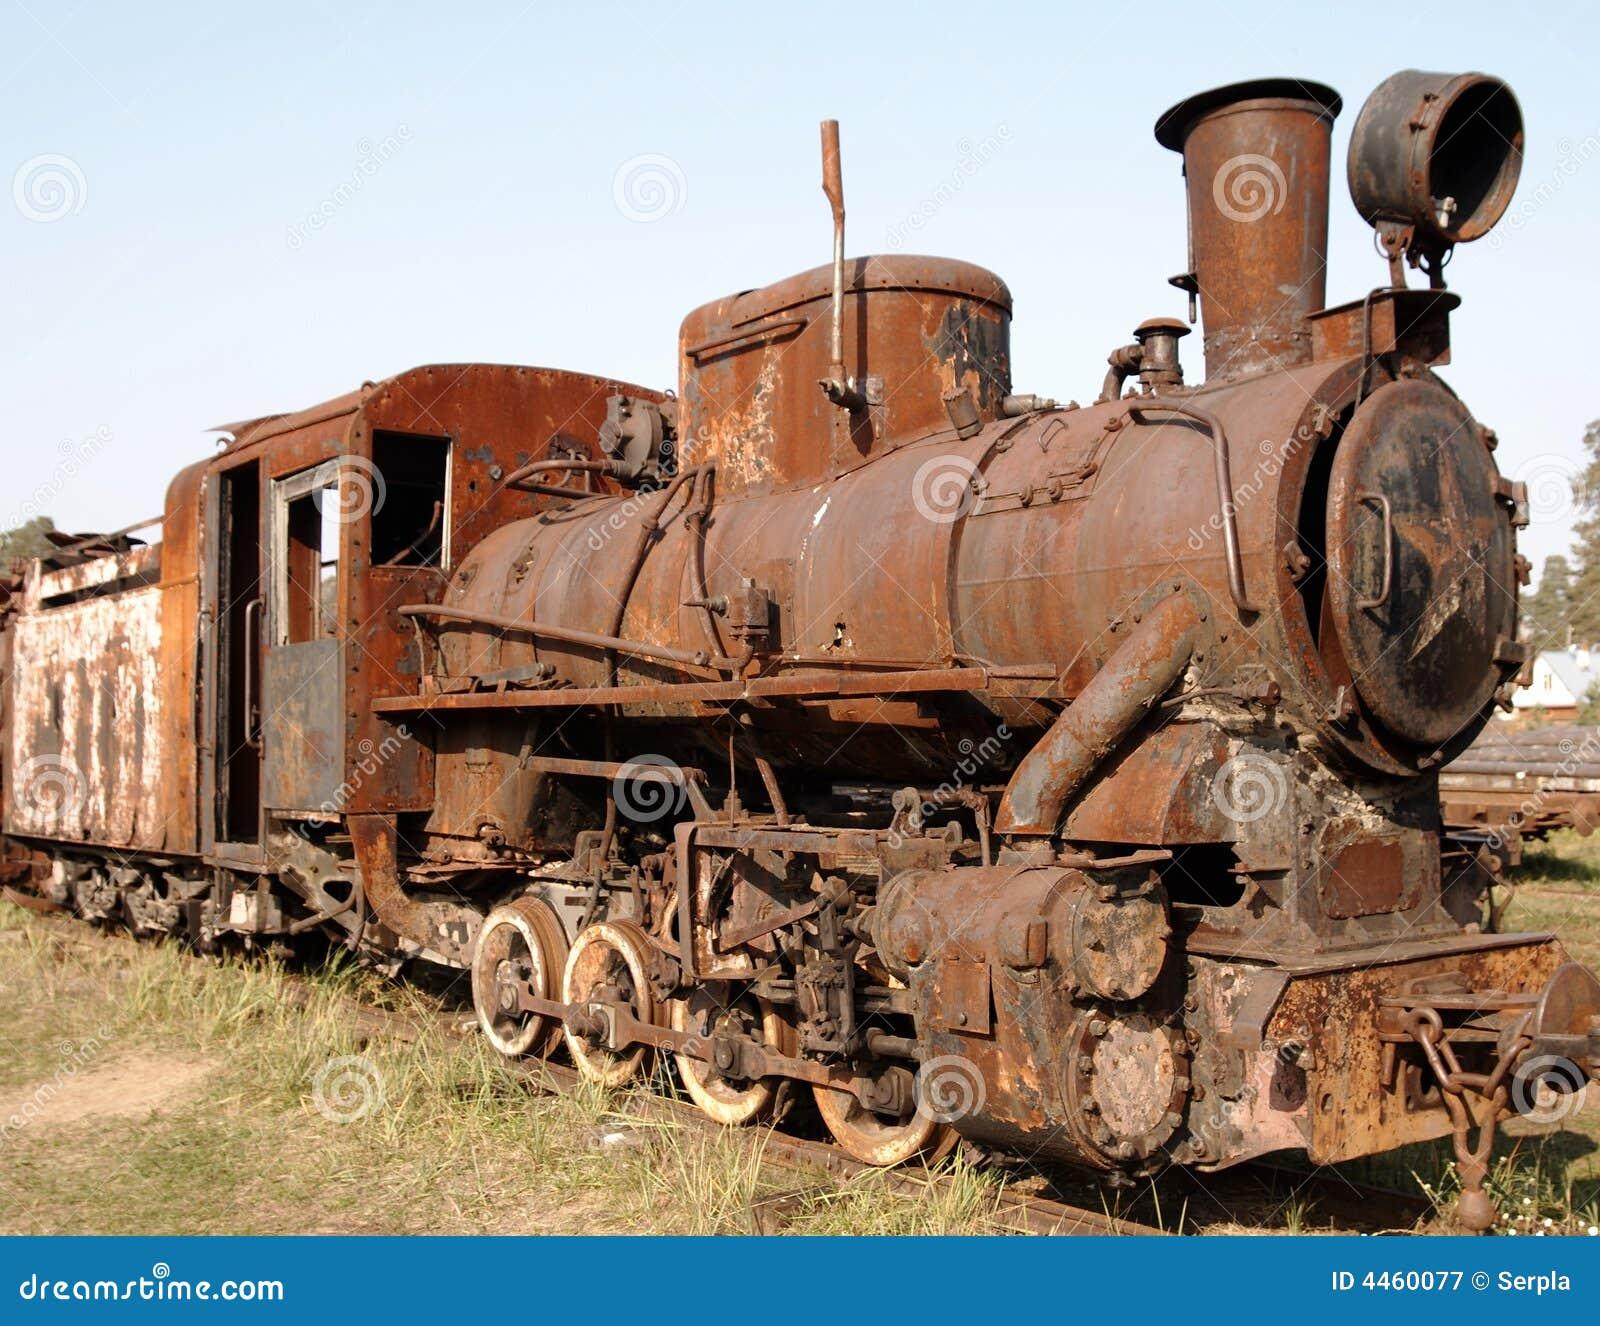 vieille locomotive vapeur image stock image du. Black Bedroom Furniture Sets. Home Design Ideas